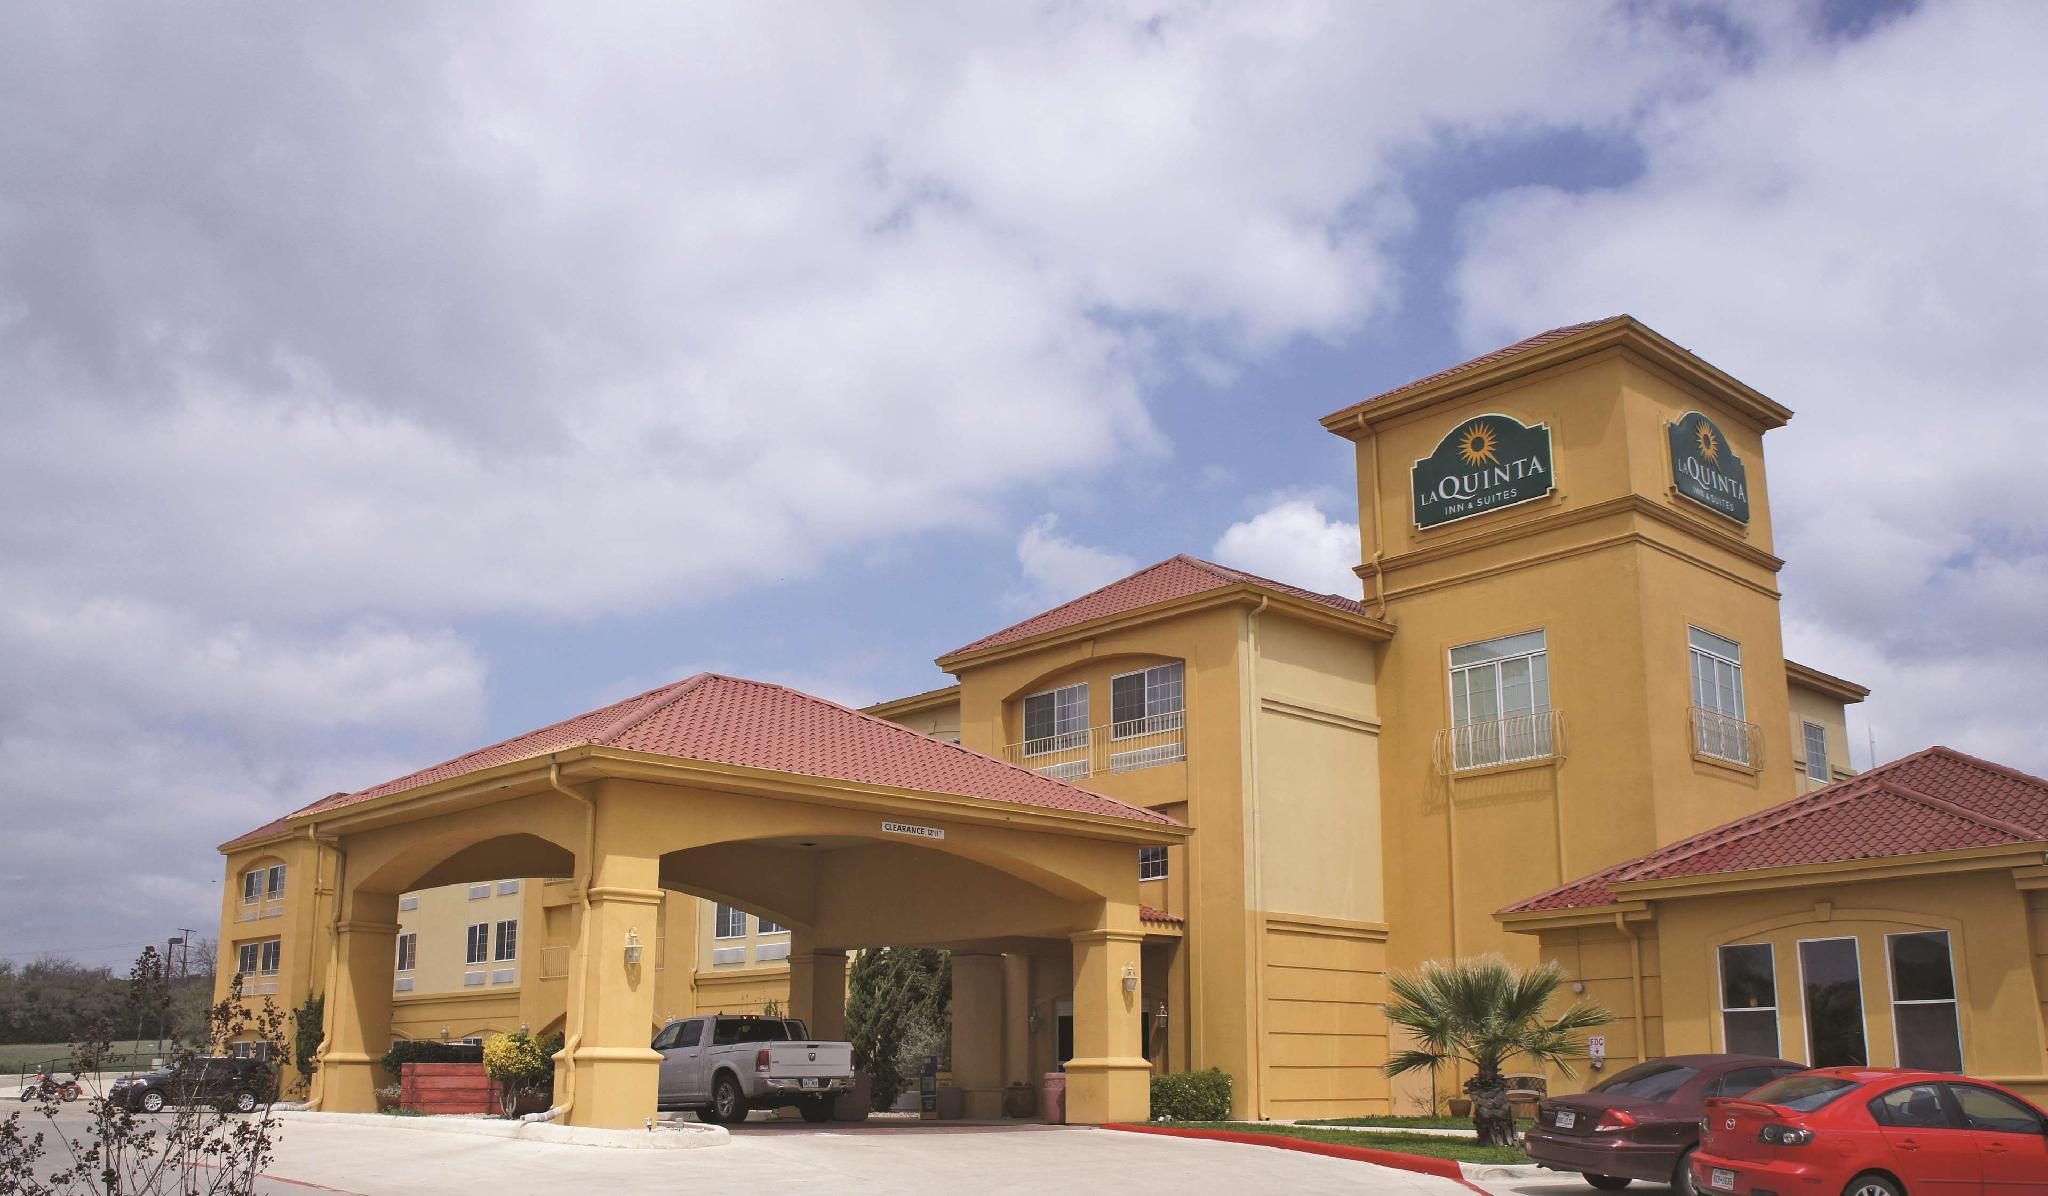 La Quinta Inn & Suites By Wyndham Kerrville Kerrville (TX) United States